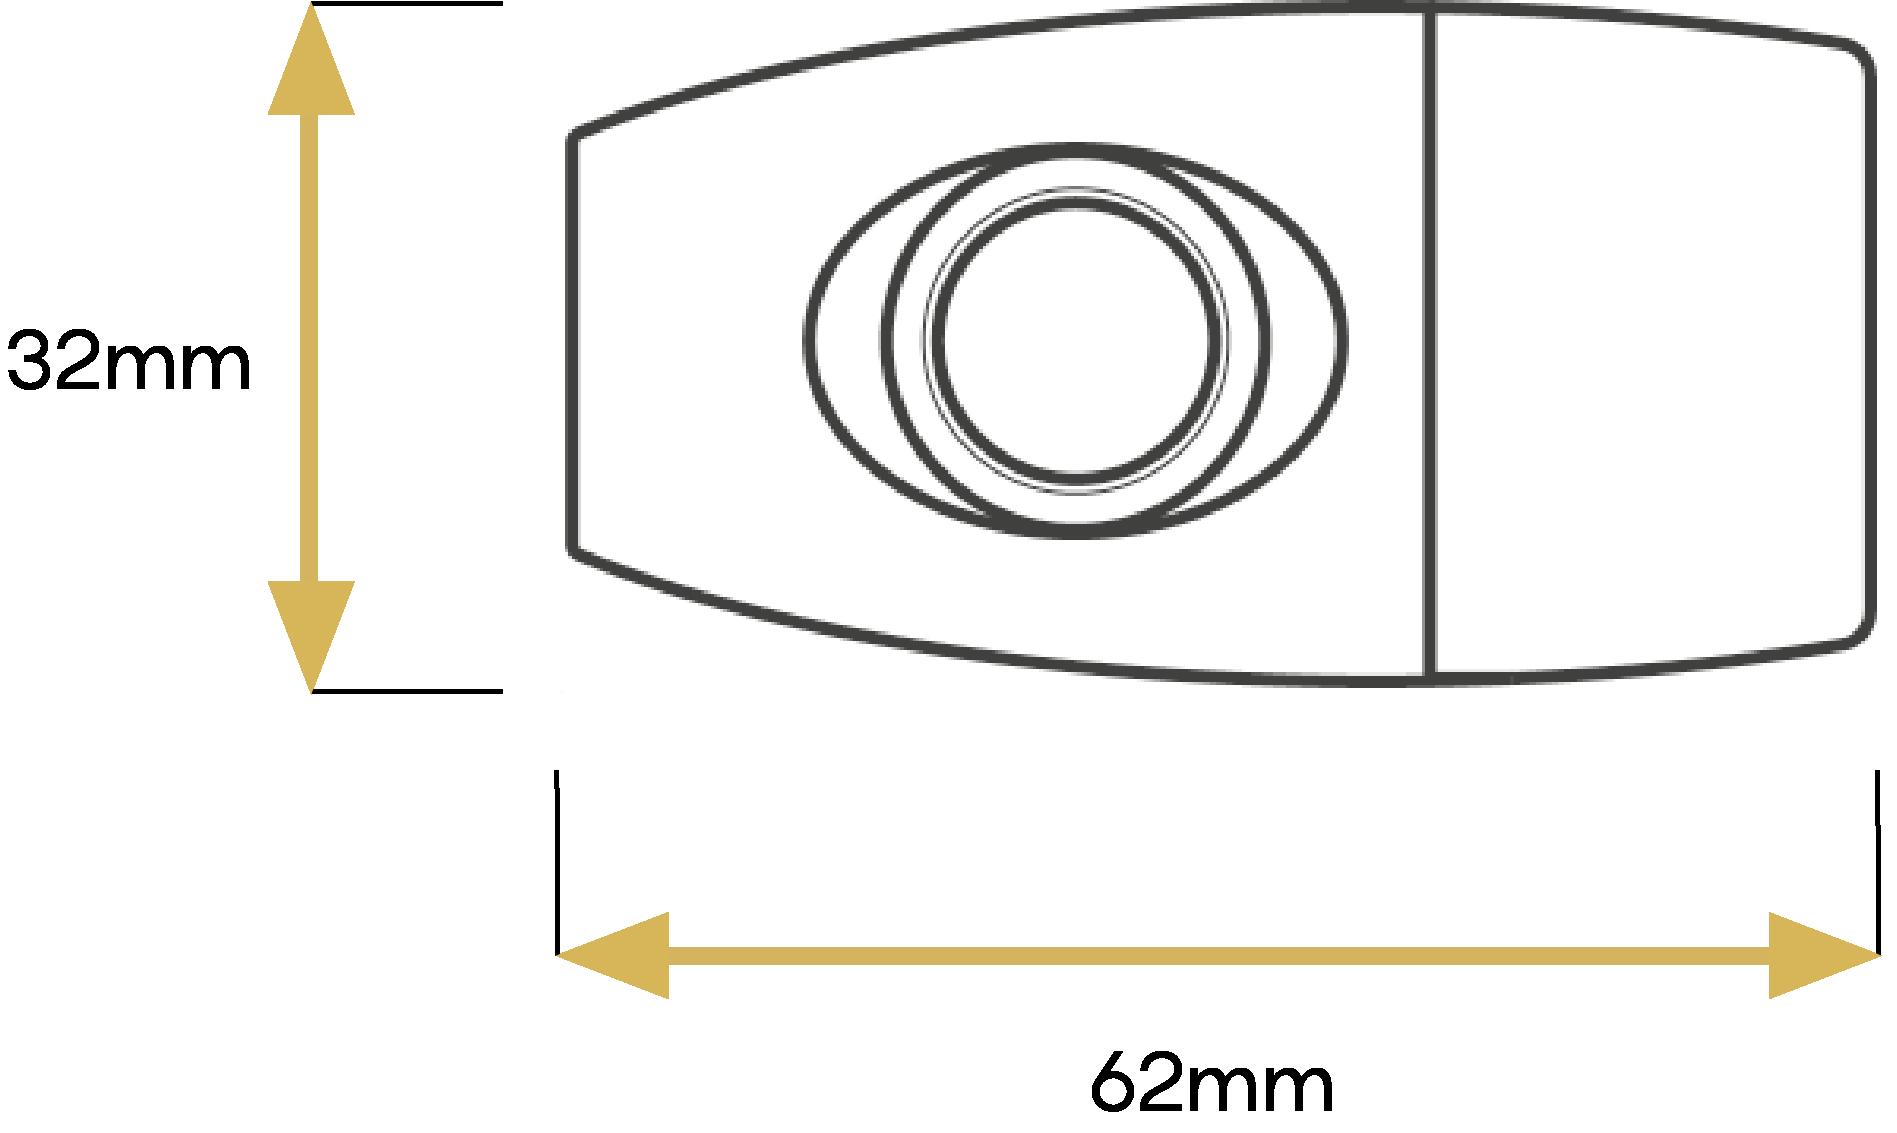 Vortex_Dimensioned.png